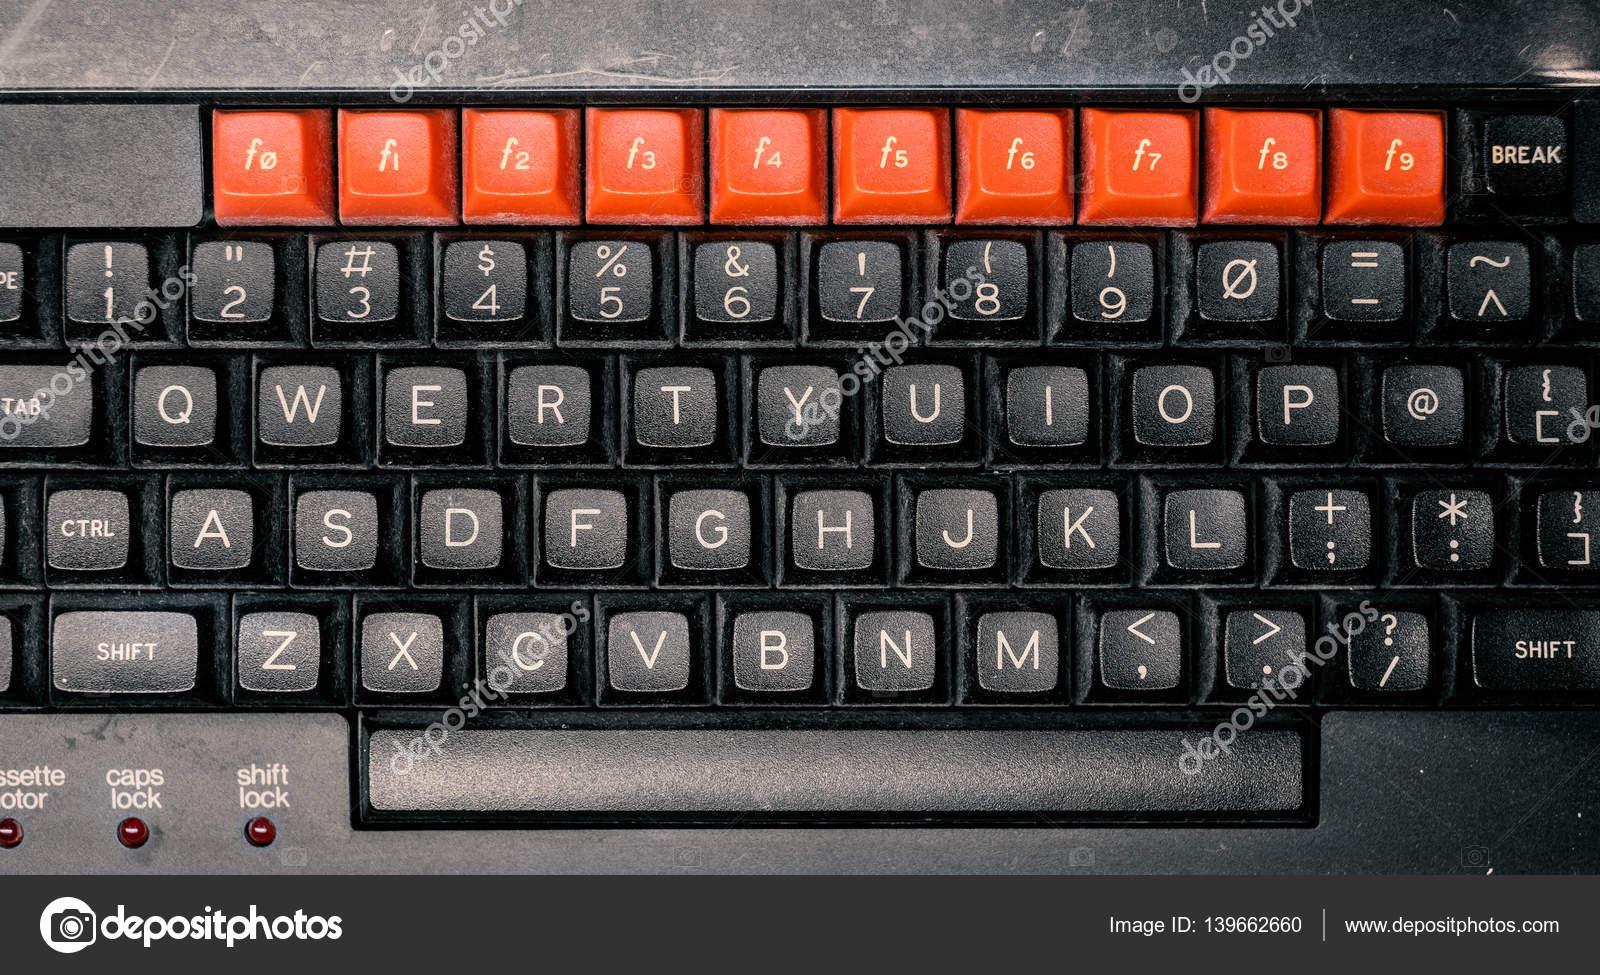 Retro vintage computer keyboard \u2014 Stock Photo © huebert